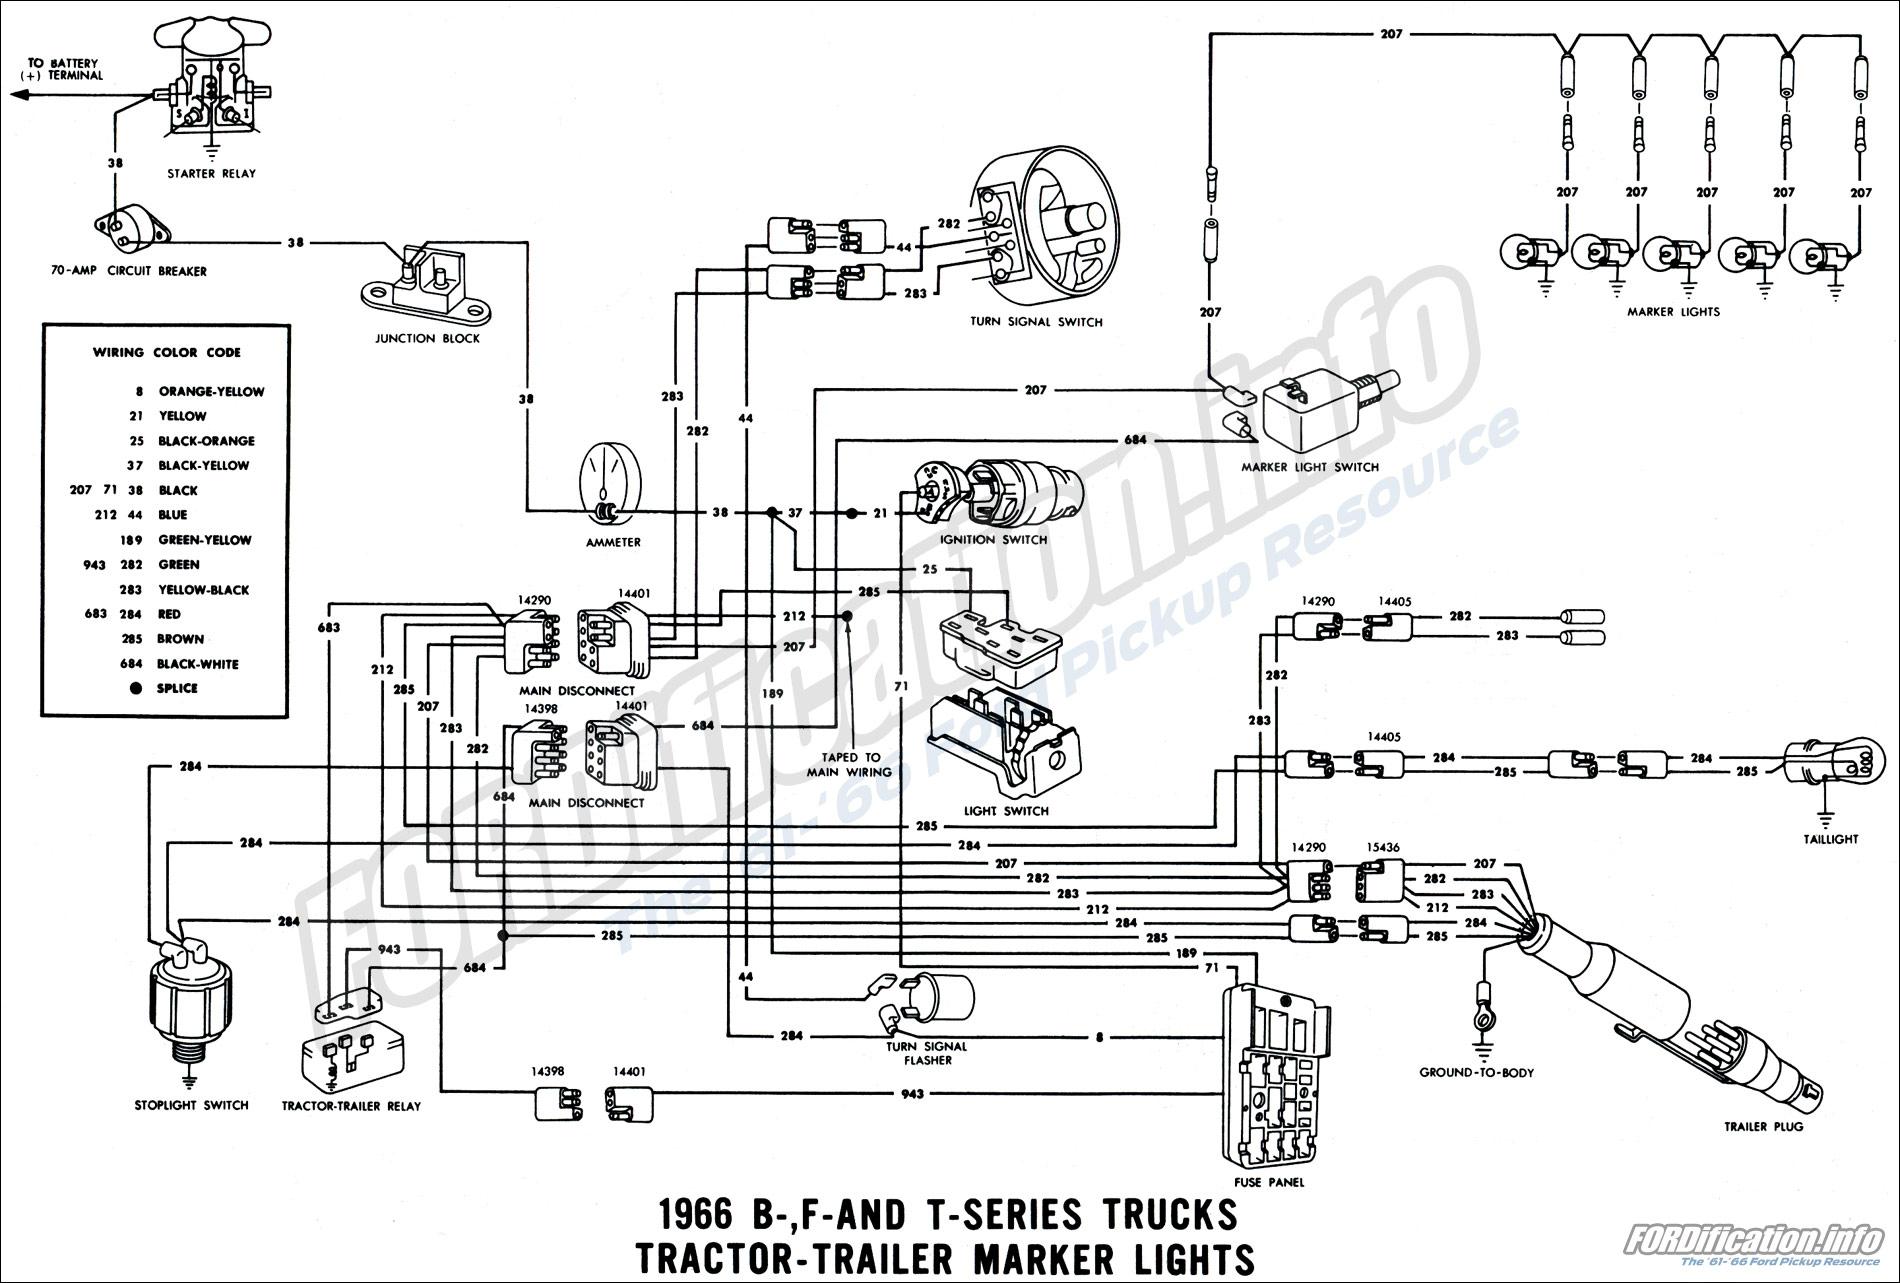 1978 chrysler distributor parts diagram